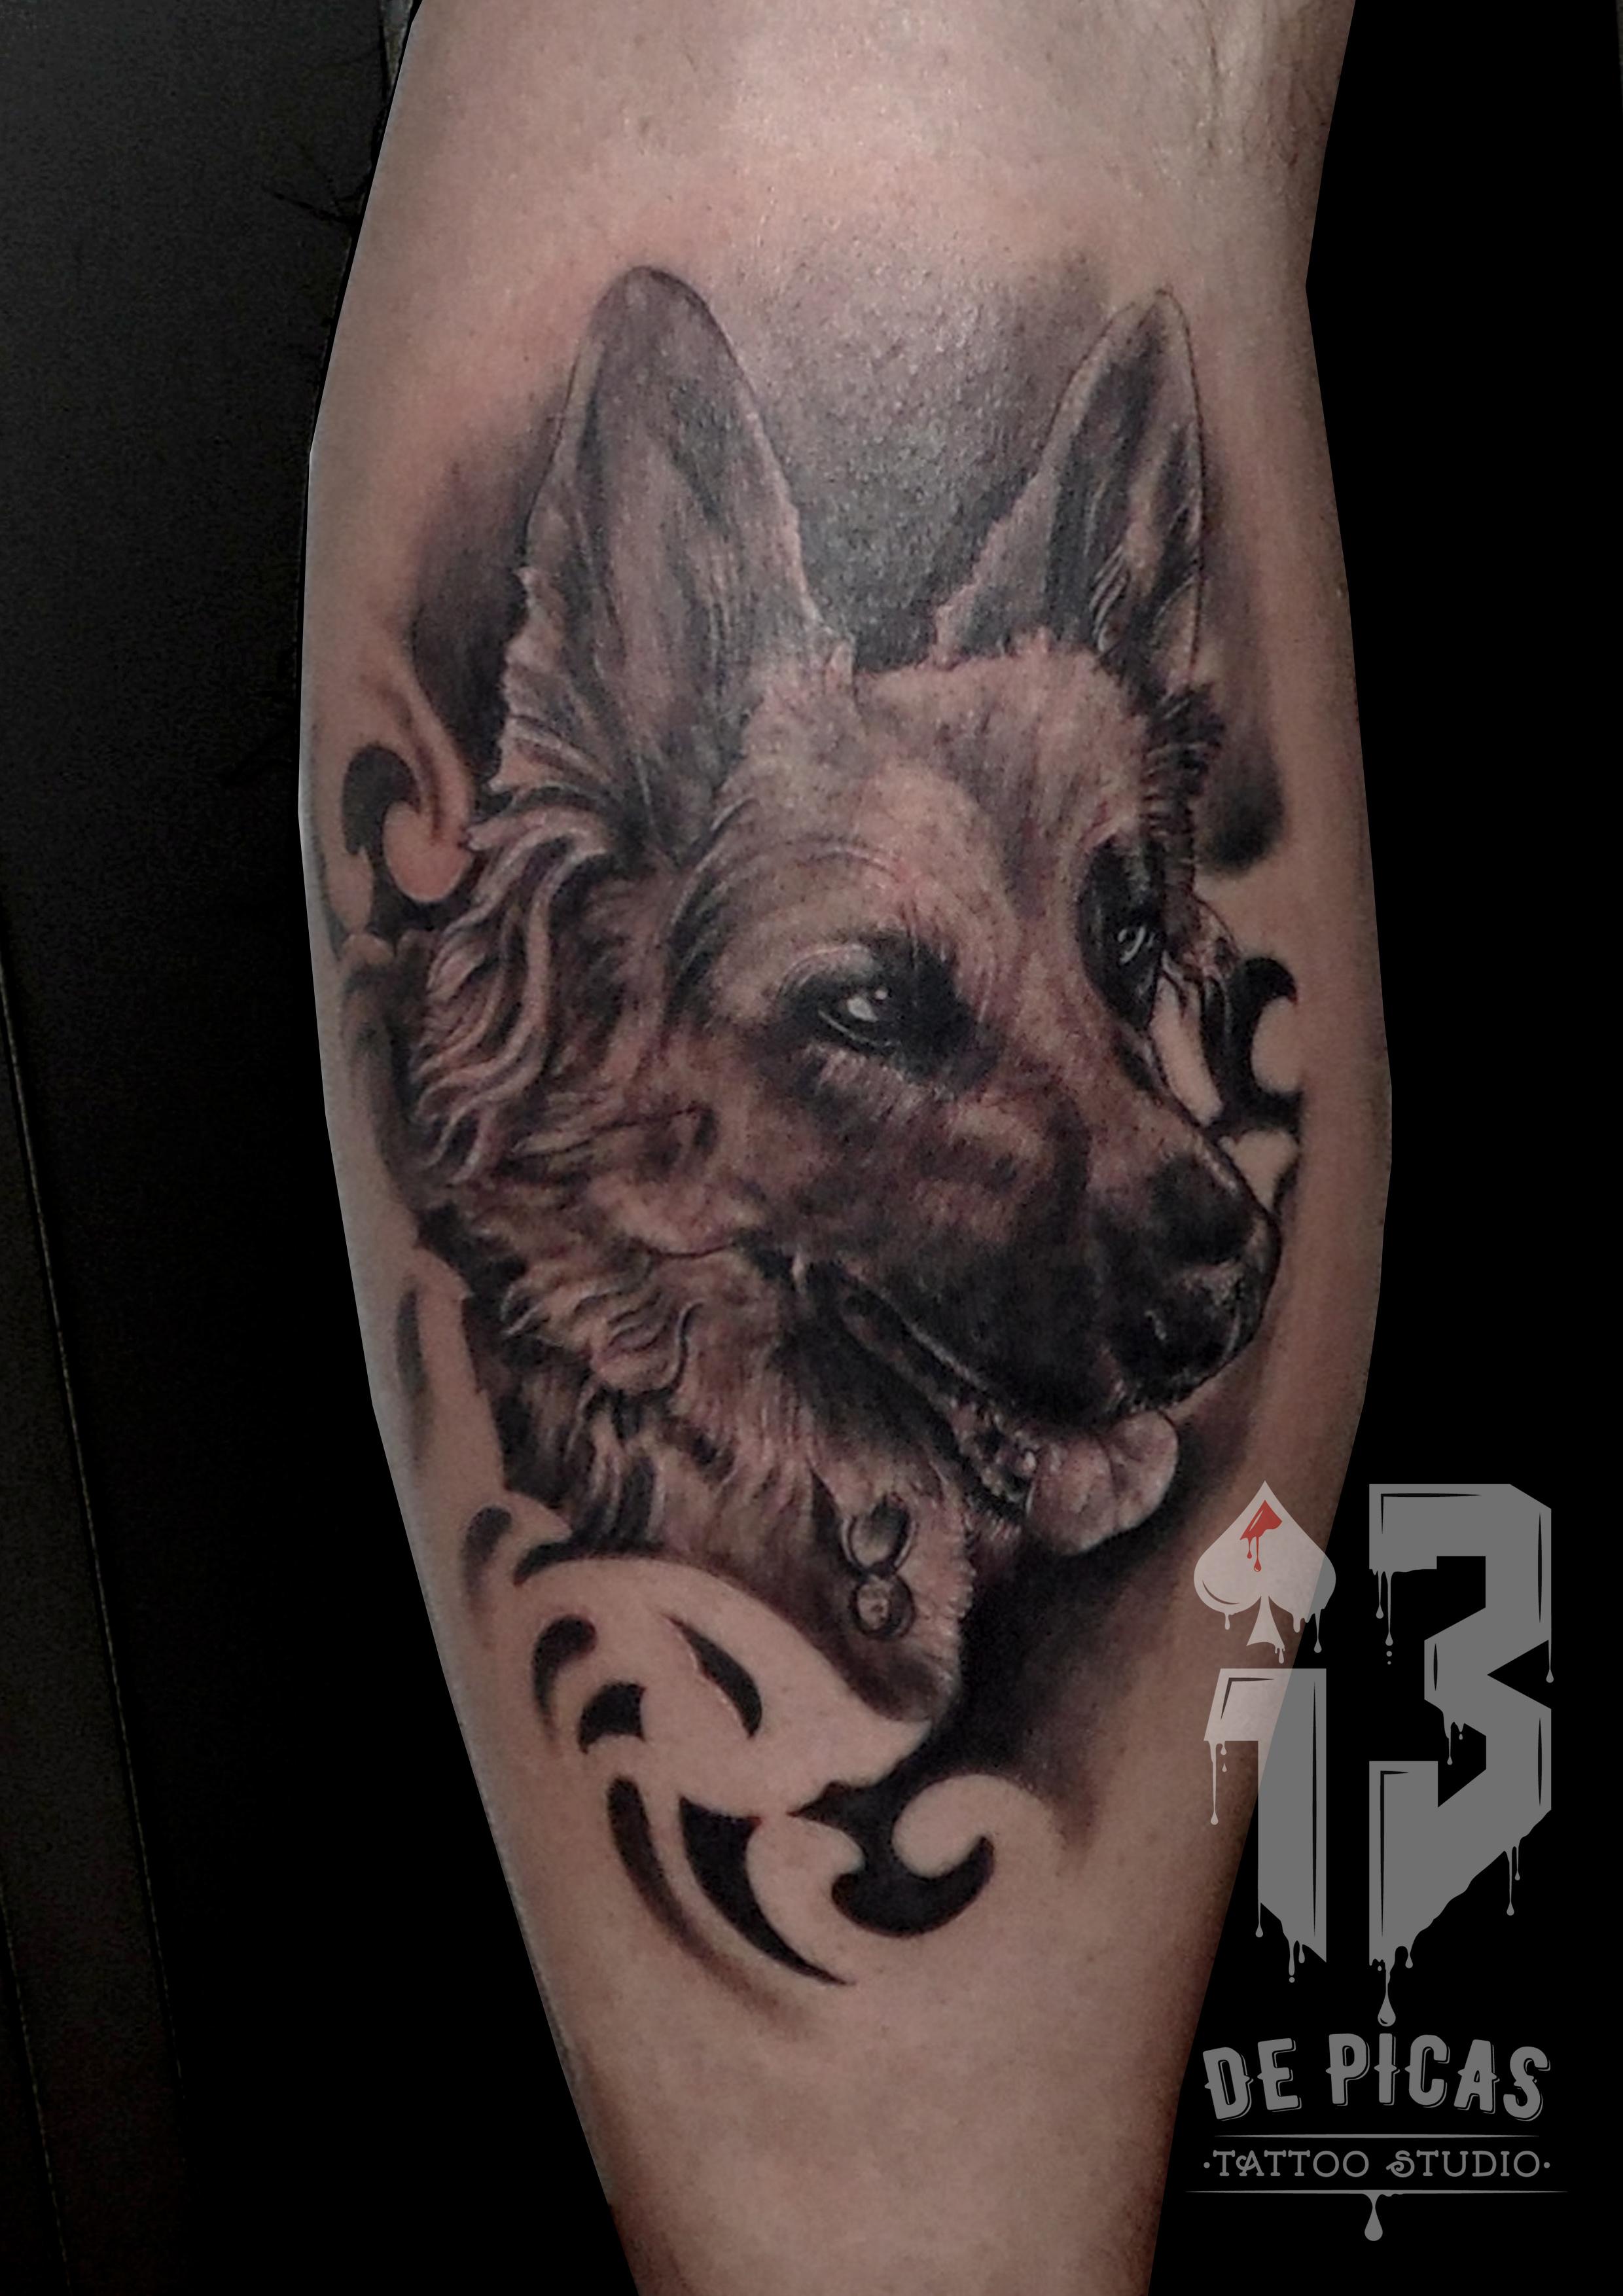 retrato perro mascota tattoo jaca huesca tatuaje realista valle sergio gemelo spain tatoist madein13 logo 13depicas trecedepicas